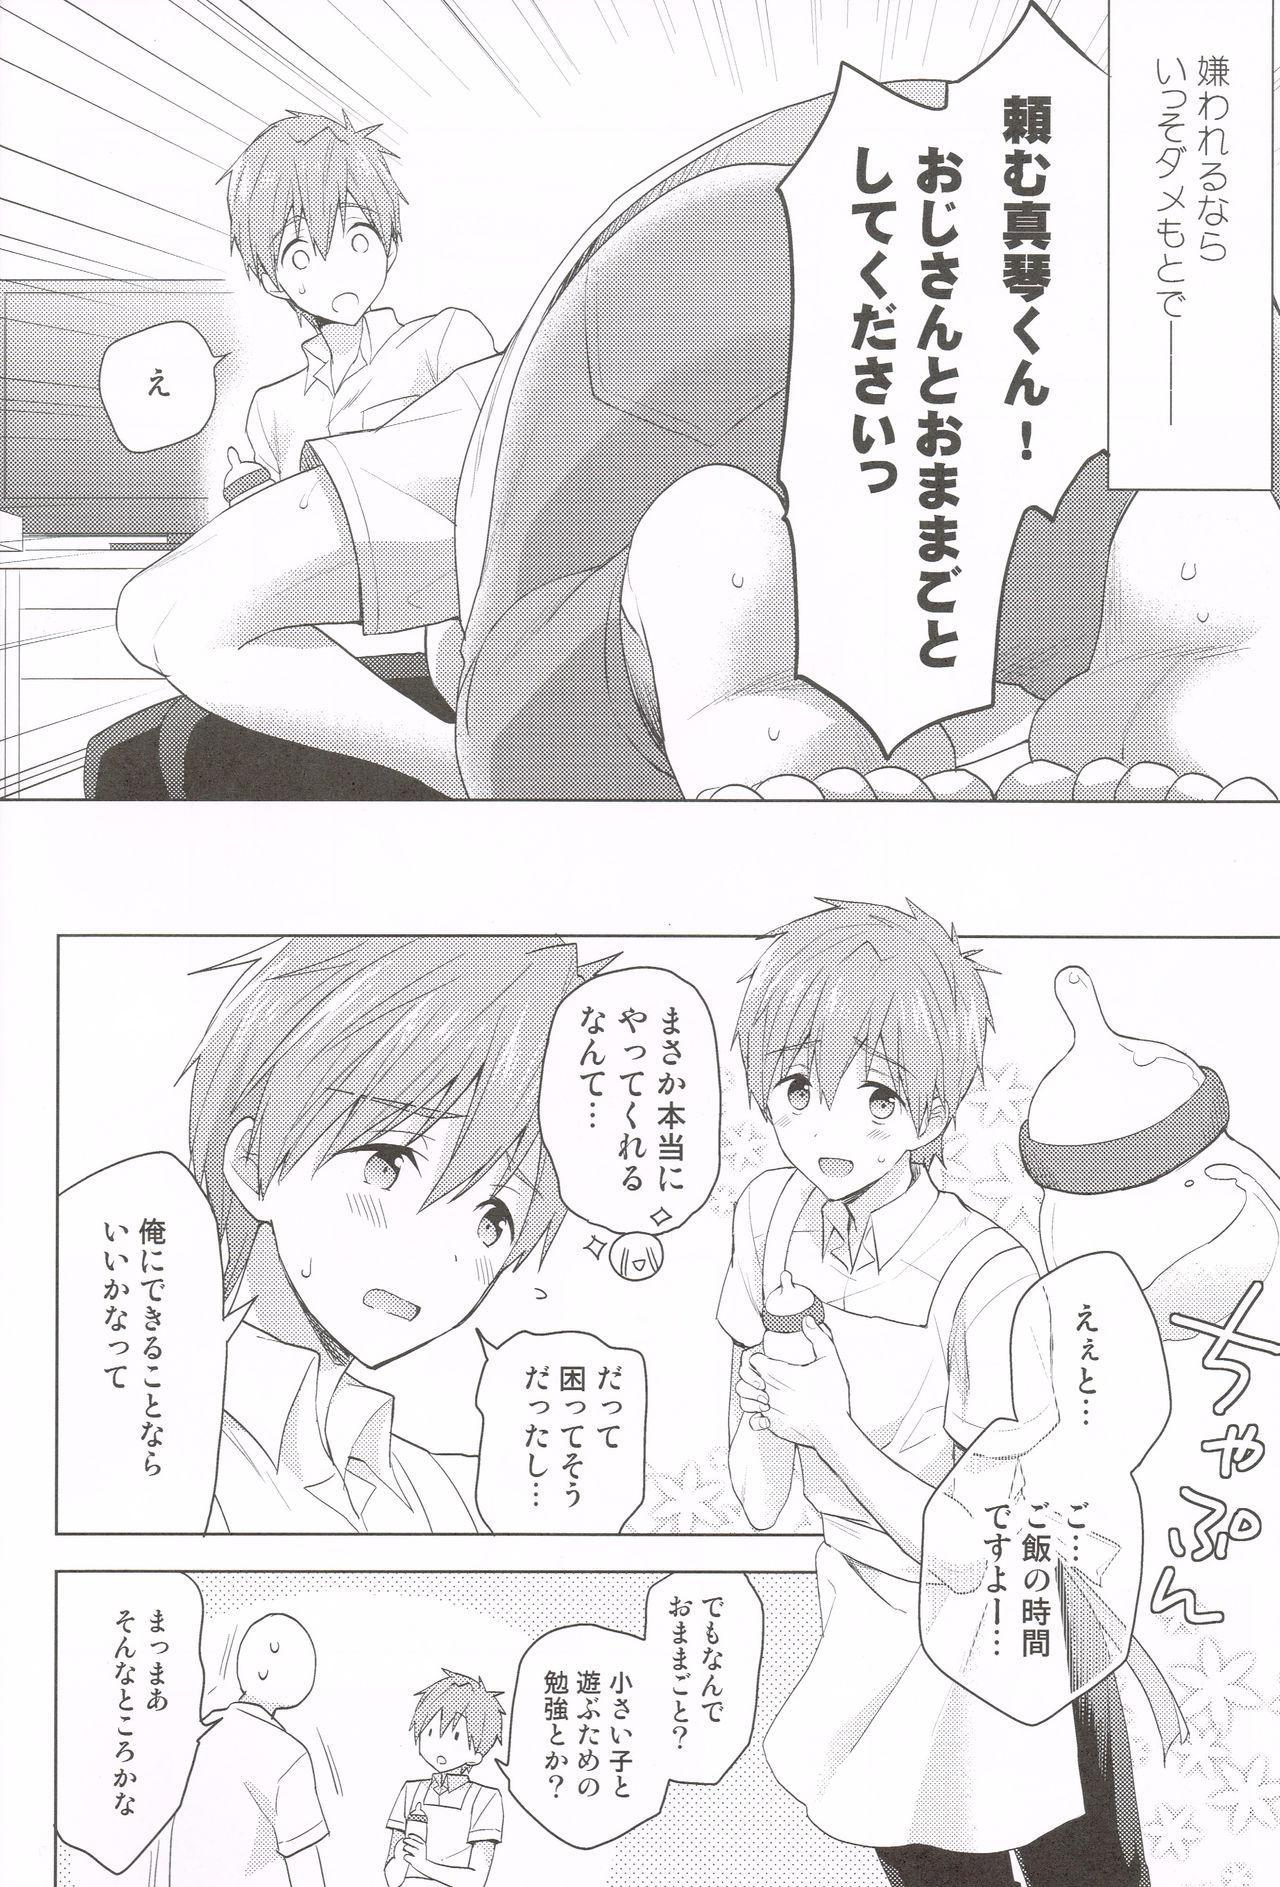 Makoto-kun to Omamagoto 4